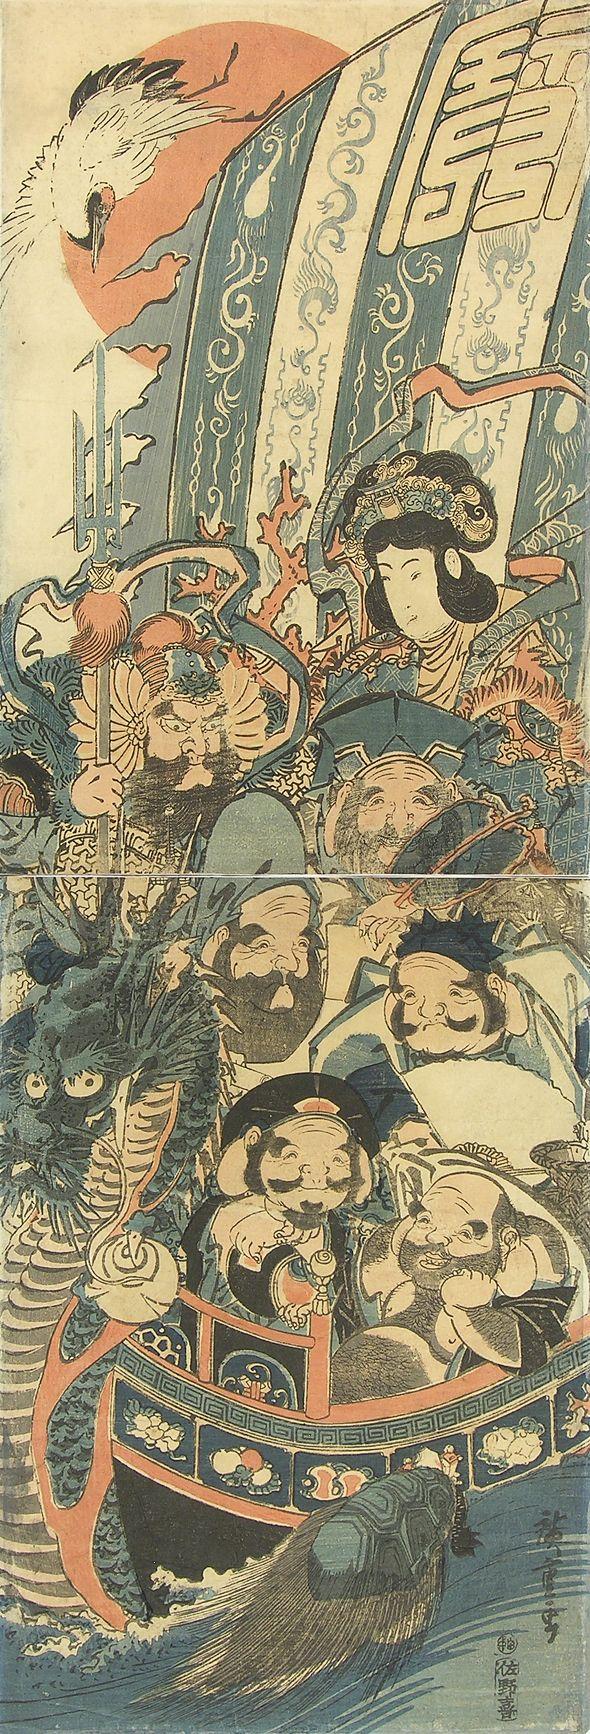 HIROSHIGE (1797-1858) Seven Gods of Good Fortune on Their Treasure Ship Signed: Hiroshige fude Publisher: Sanoki circa mid 1840s kakemono-e (vertical diptych)